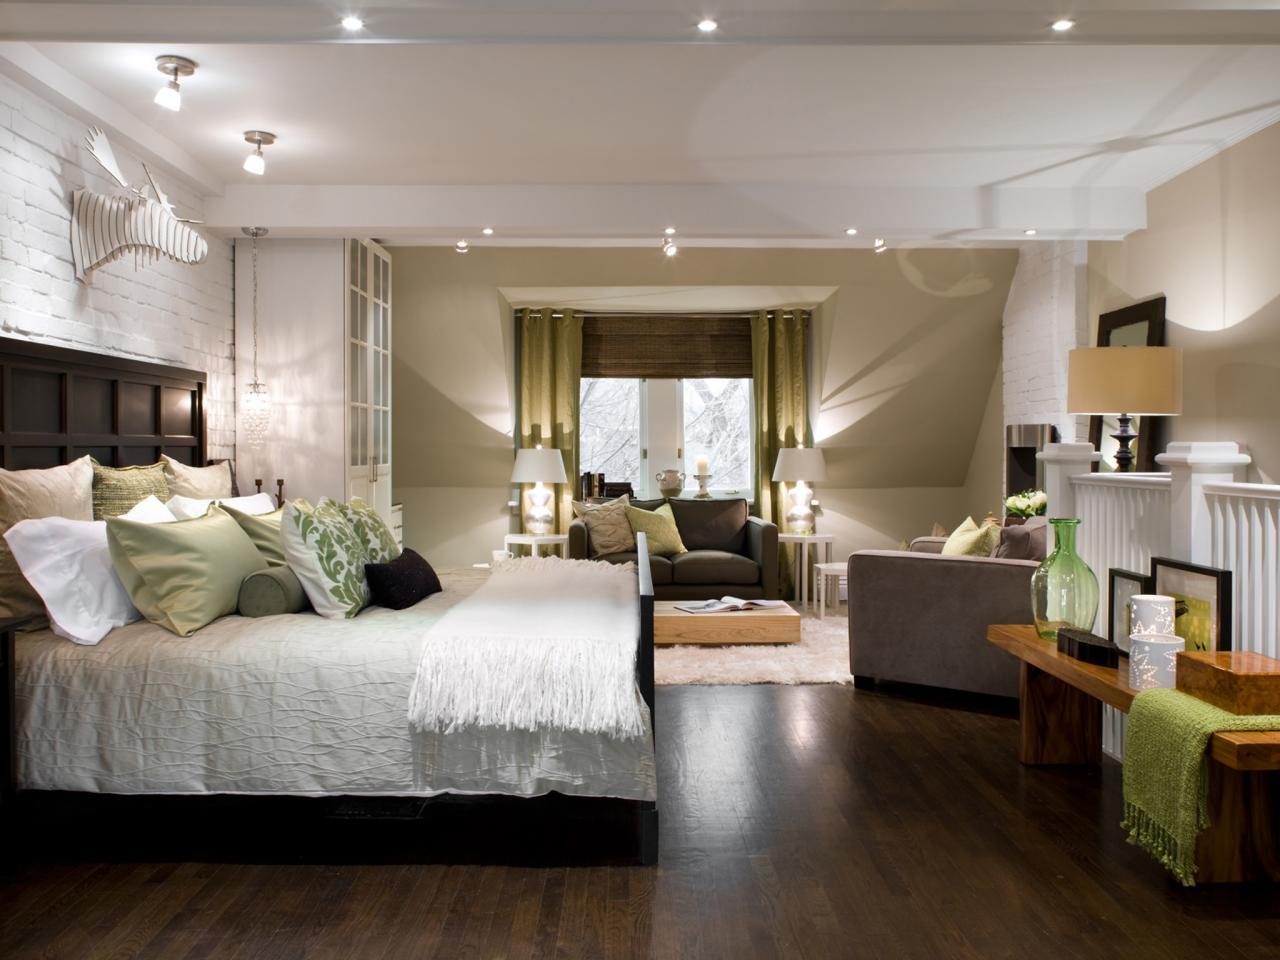 bedroom lights bedroom lighting ideas and styles BSTZGQP